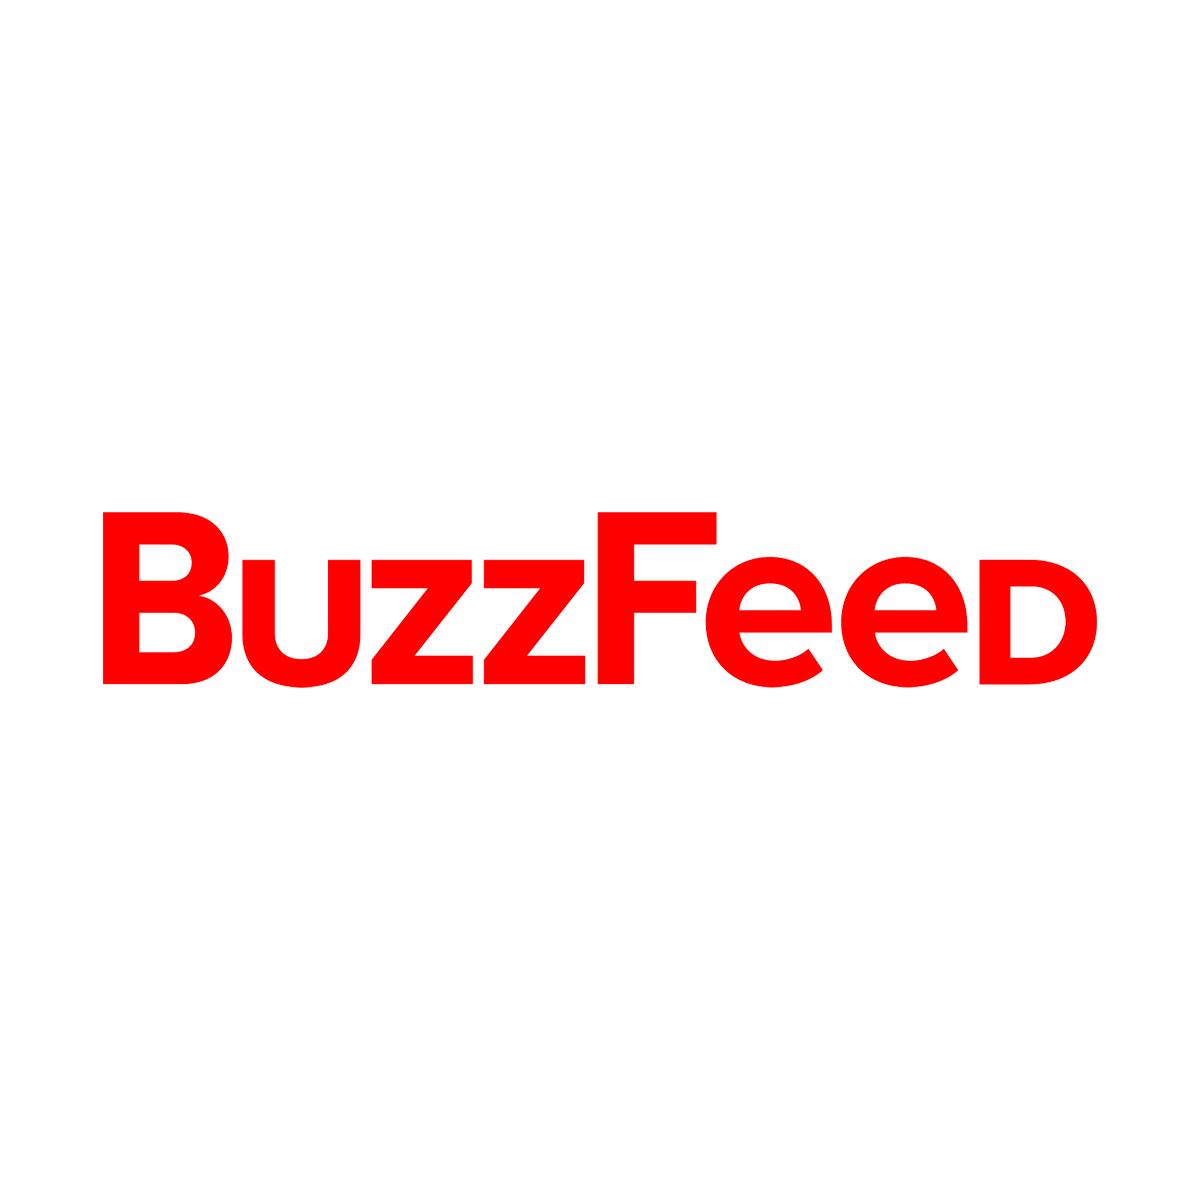 buzzfeed_b2bsitelogo.jpg